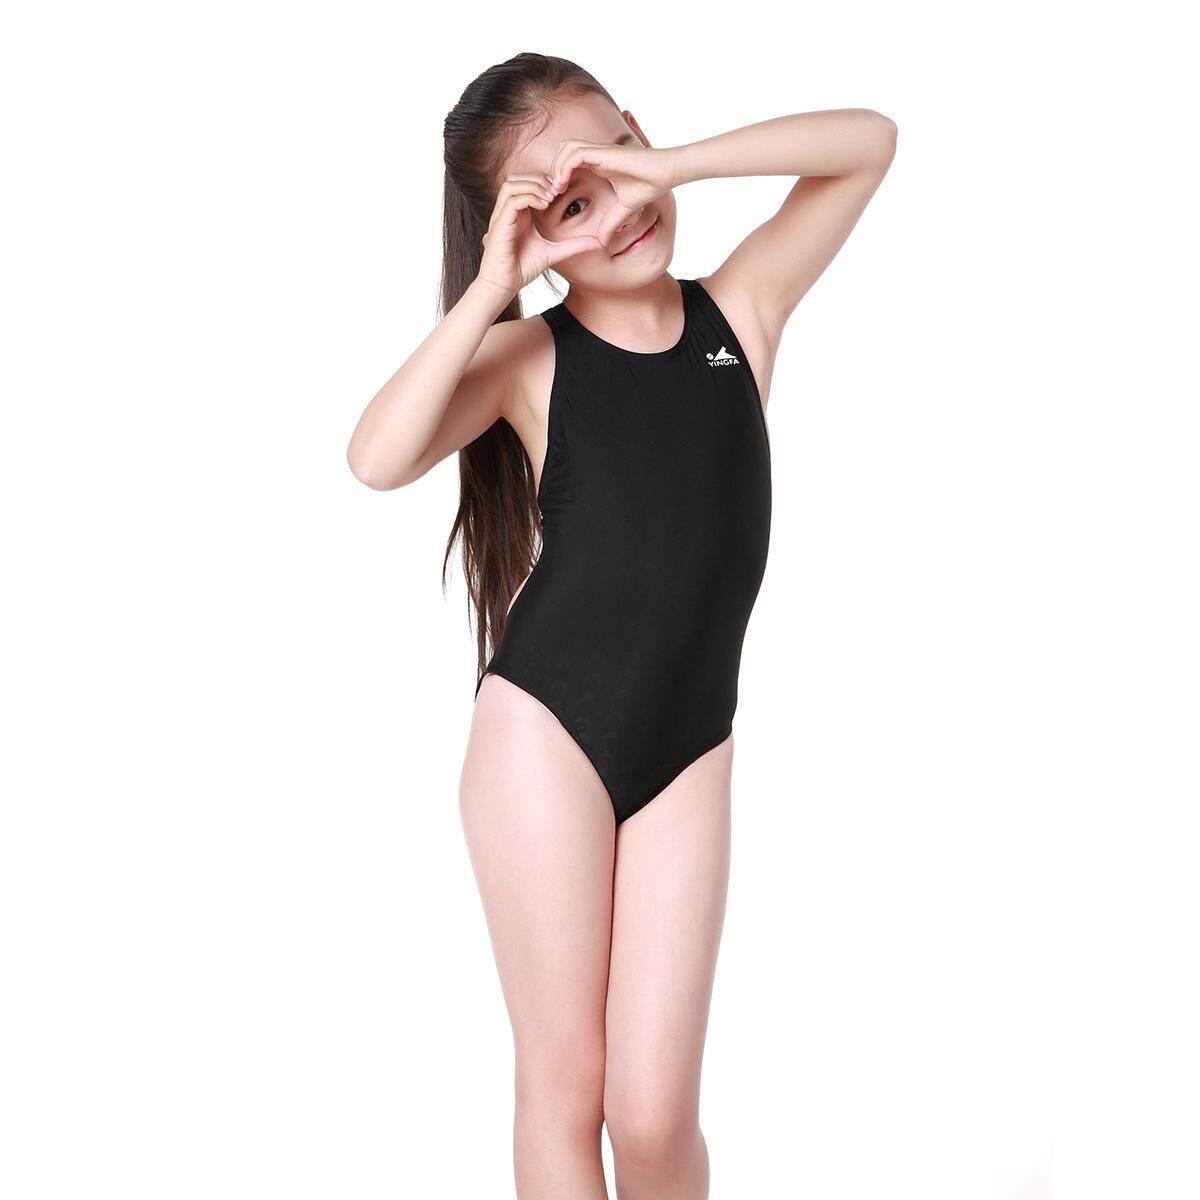 Yingfa Baju Renang Anak-anak Pakaian Renang Bahan Sisik Ikan Pola